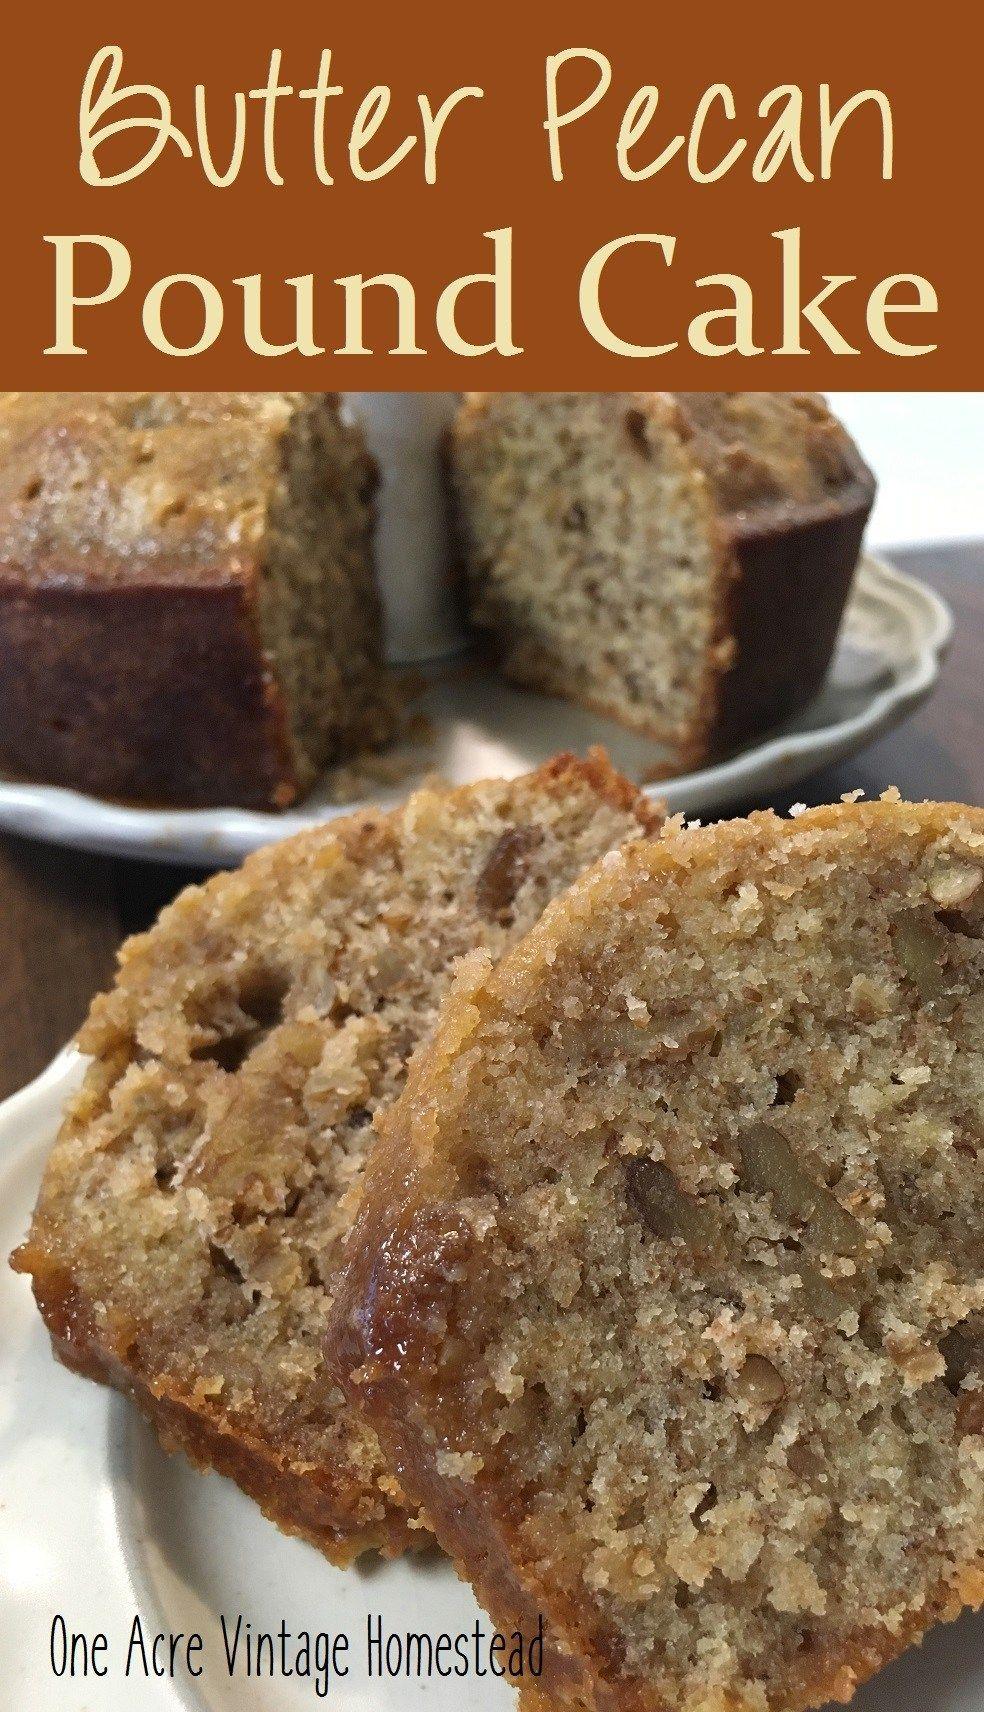 Butter Pecan Pound Cake ⋆ One Acre Vintage & Pumpkin Patch Mtn.